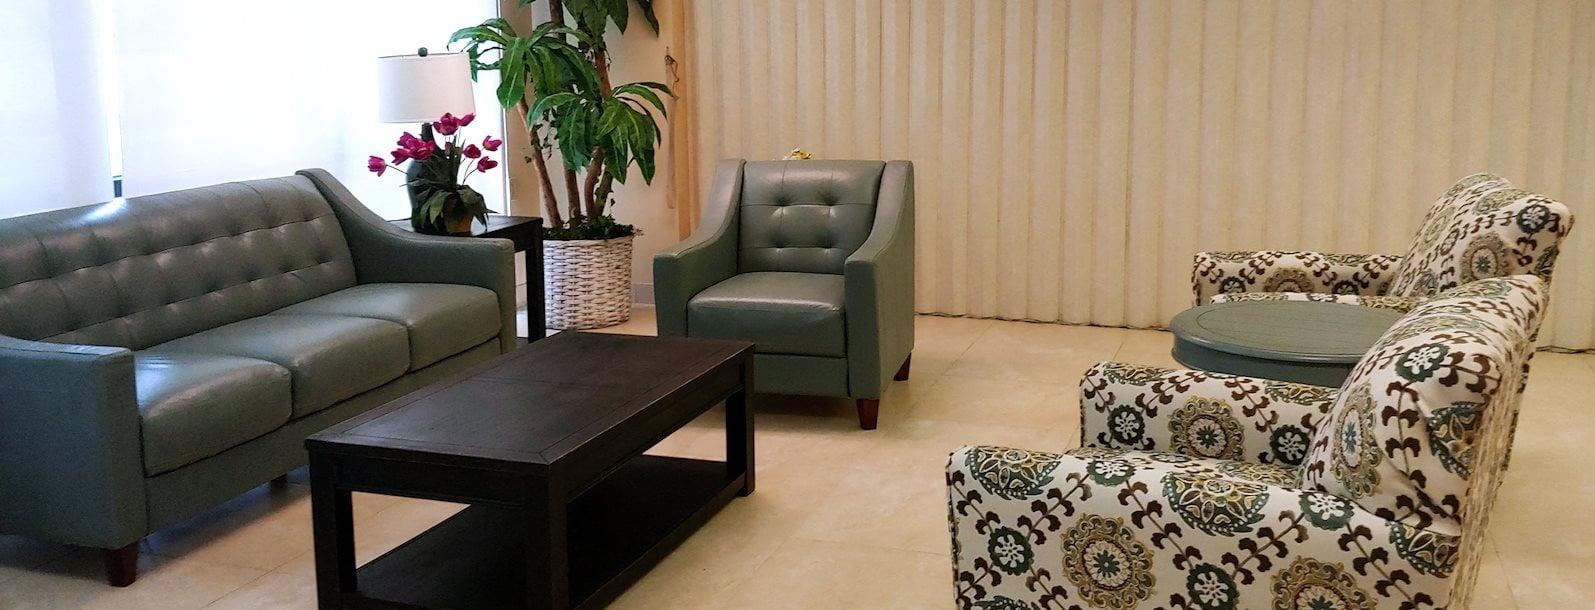 B'nai B'rith I, II, & III apartments in deerfield beach lobby